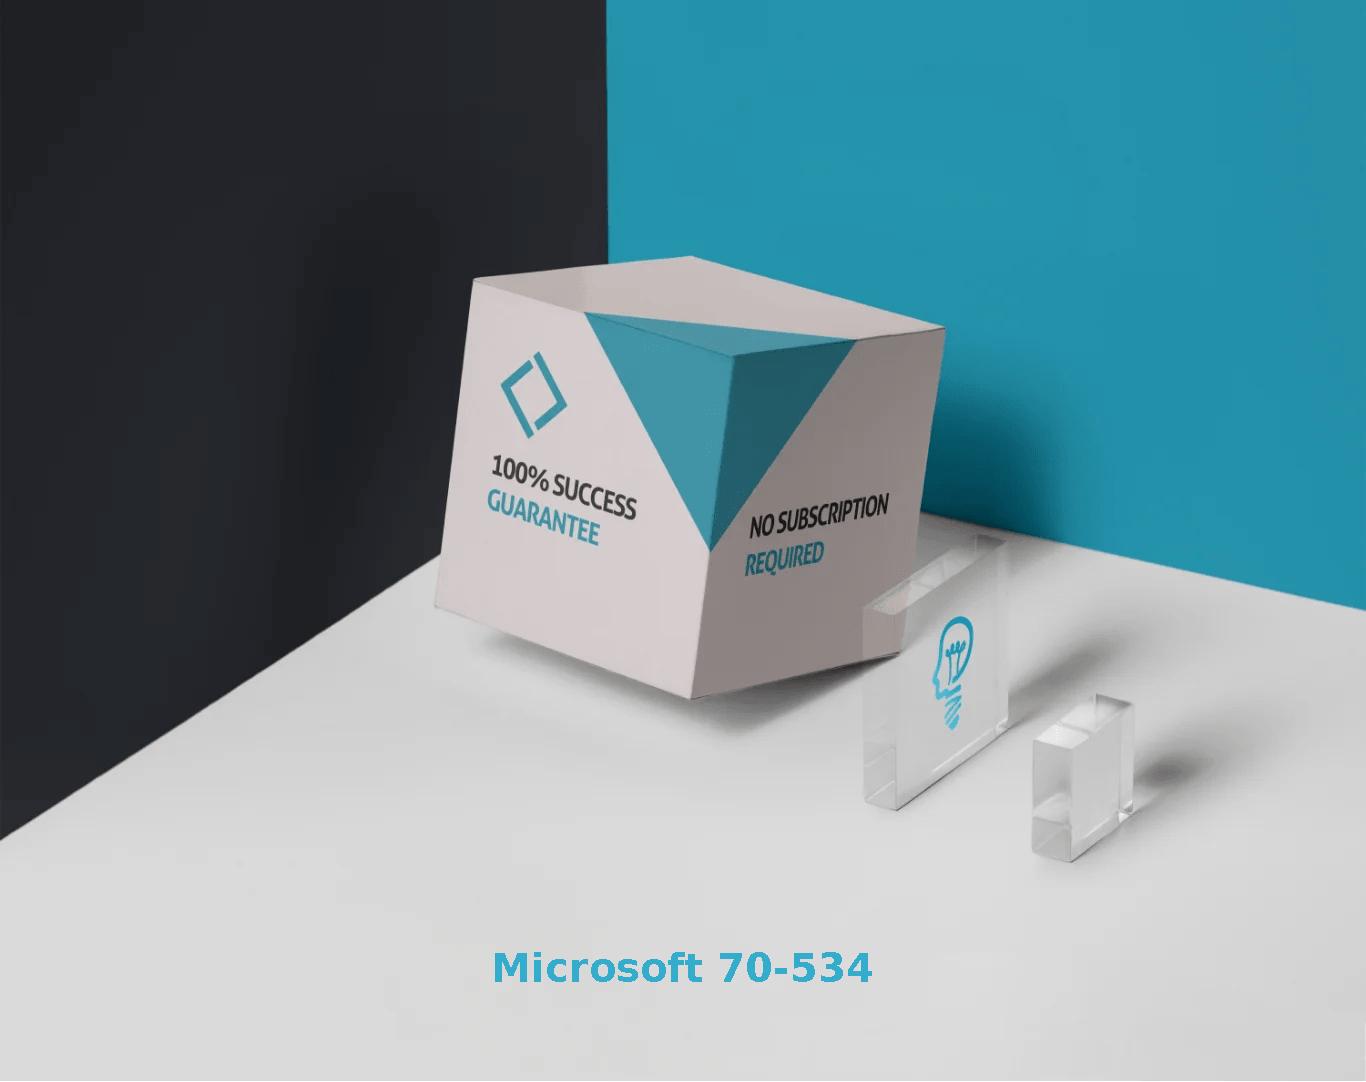 Microsoft 70-534 Exams